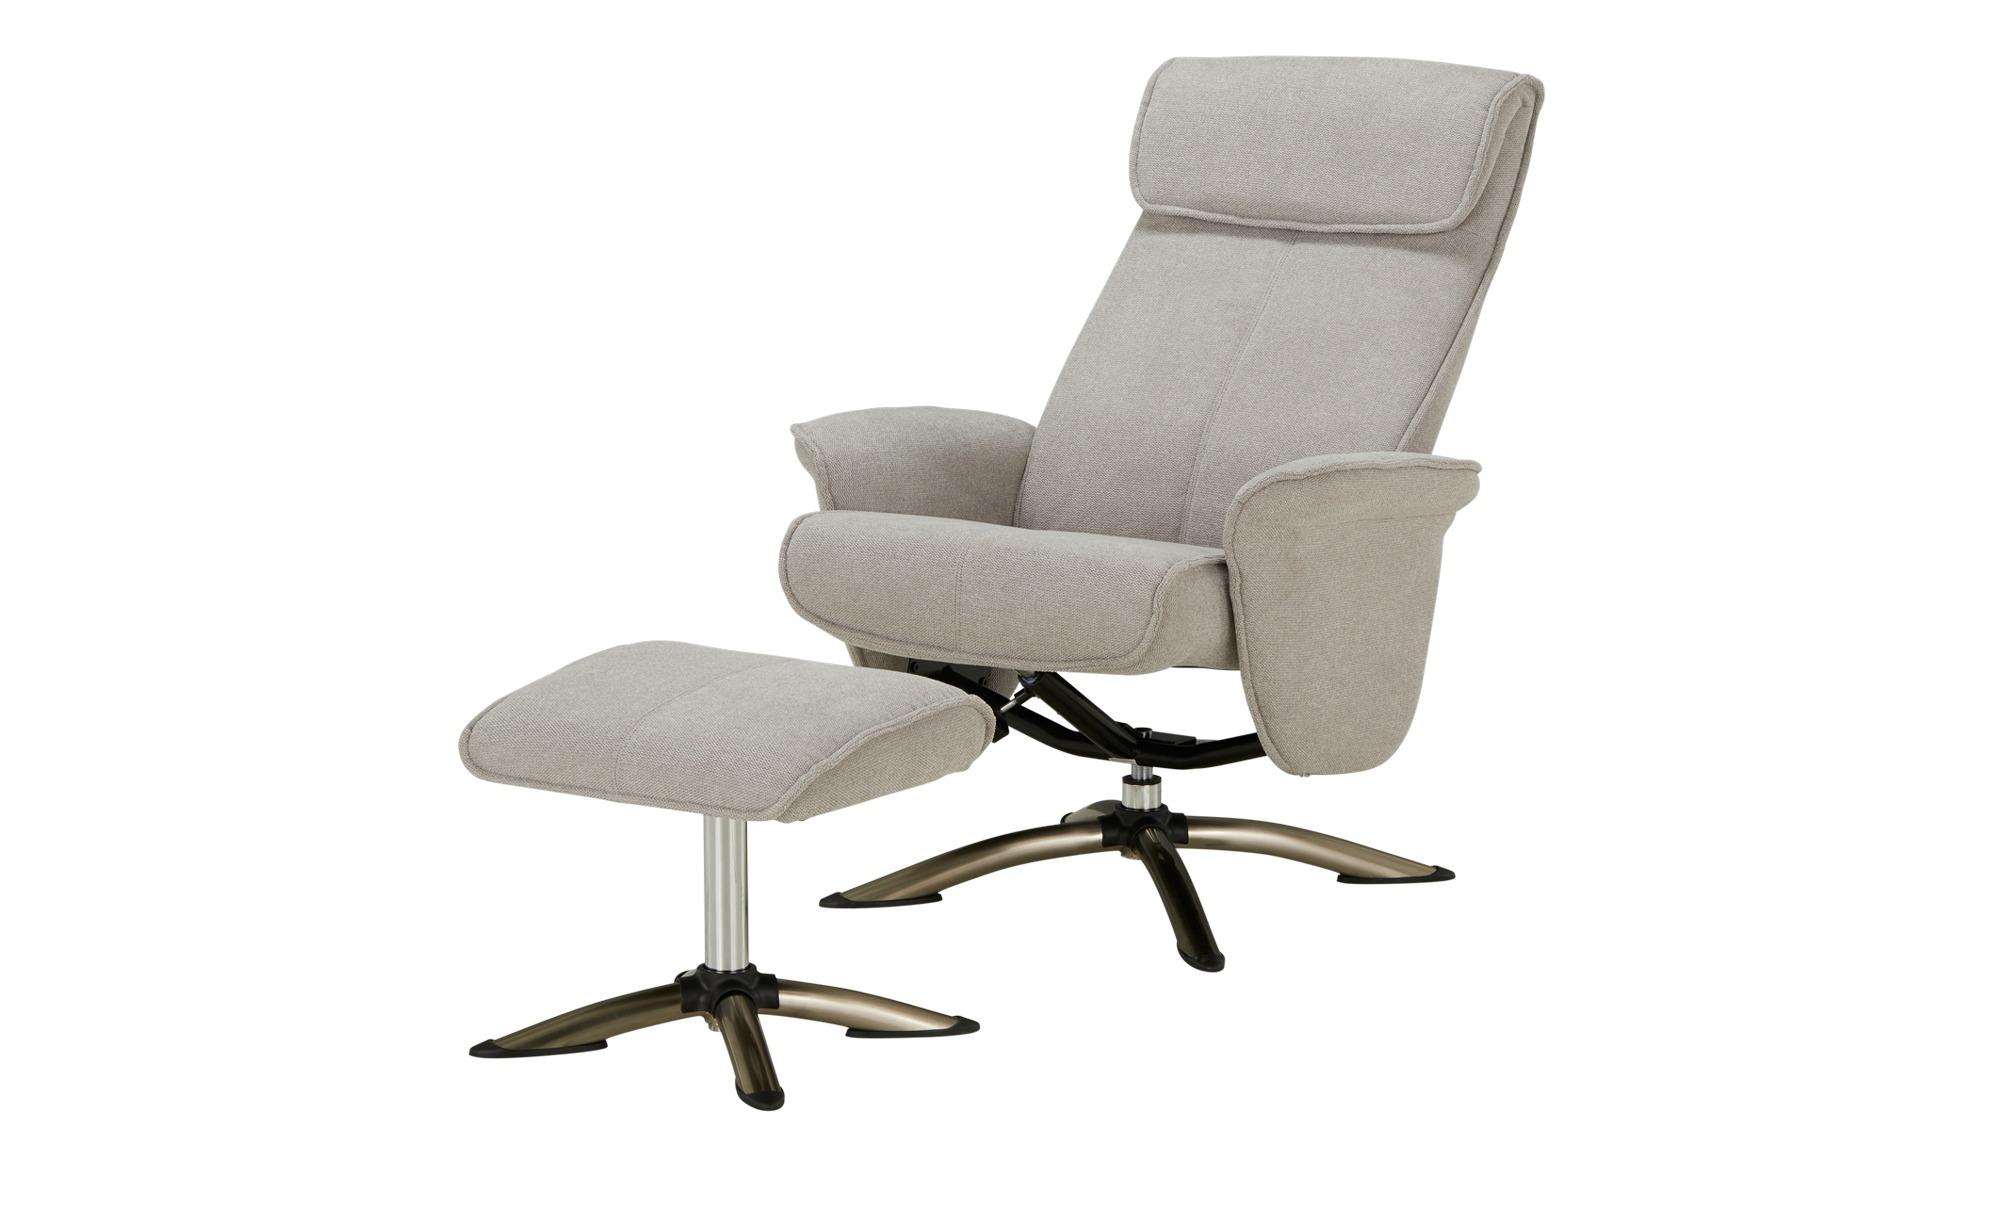 Fernsehsessel mit Hocker  Babette ¦ grau ¦ Maße (cm): B: 76 H: 105 T: 81 Polstermöbel > Sessel > Polstersessel - Höffner